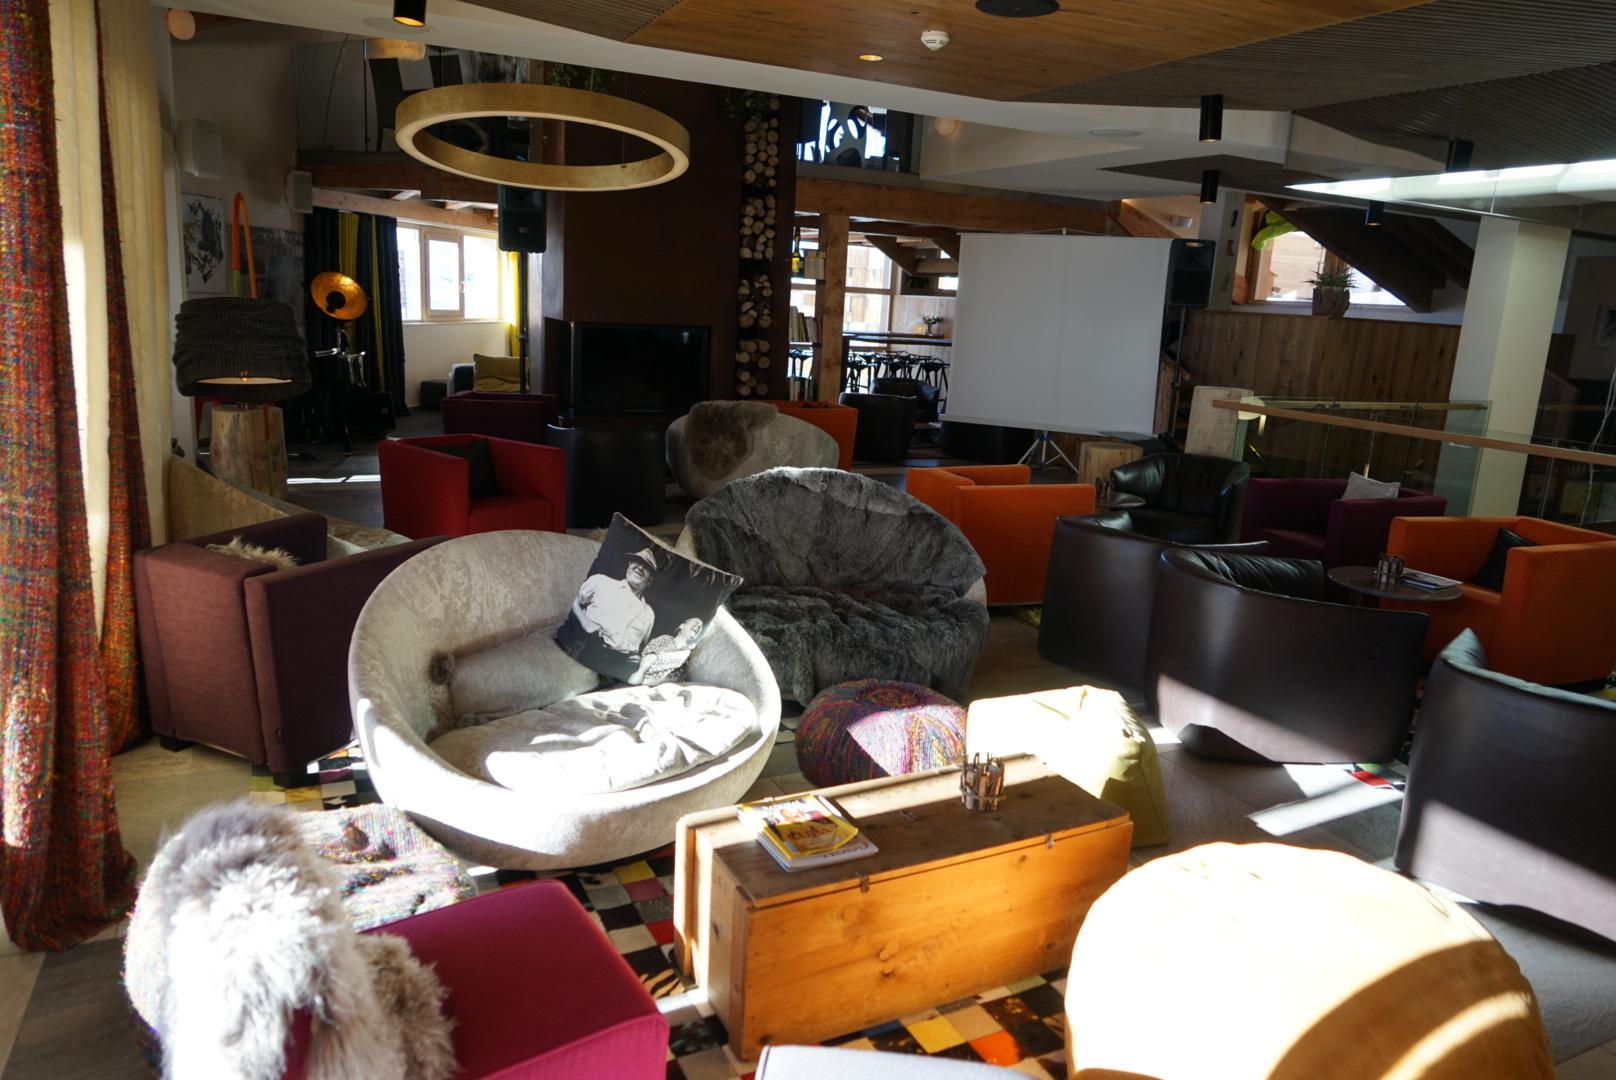 lounge, fireplace, library, val thorens, pashmina, hotel, pashmina hotel, refuge, terrace, mountain, trip, holidays